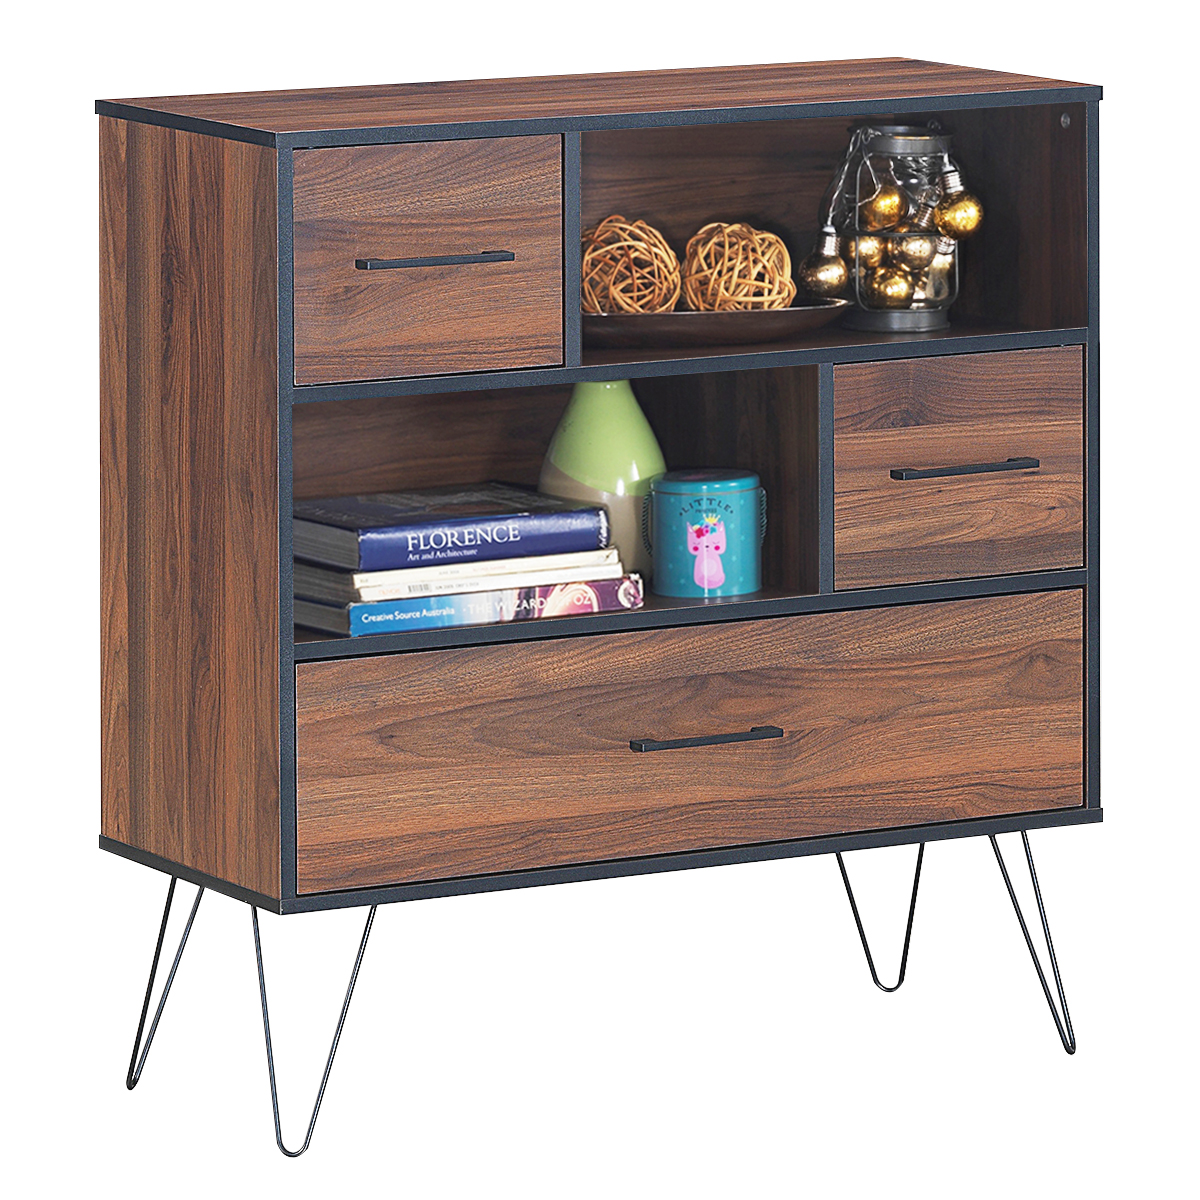 Costway Sideboard Storage Cabinet Multipurpose Display Unit w/Metal Leg & Drawers Walnut